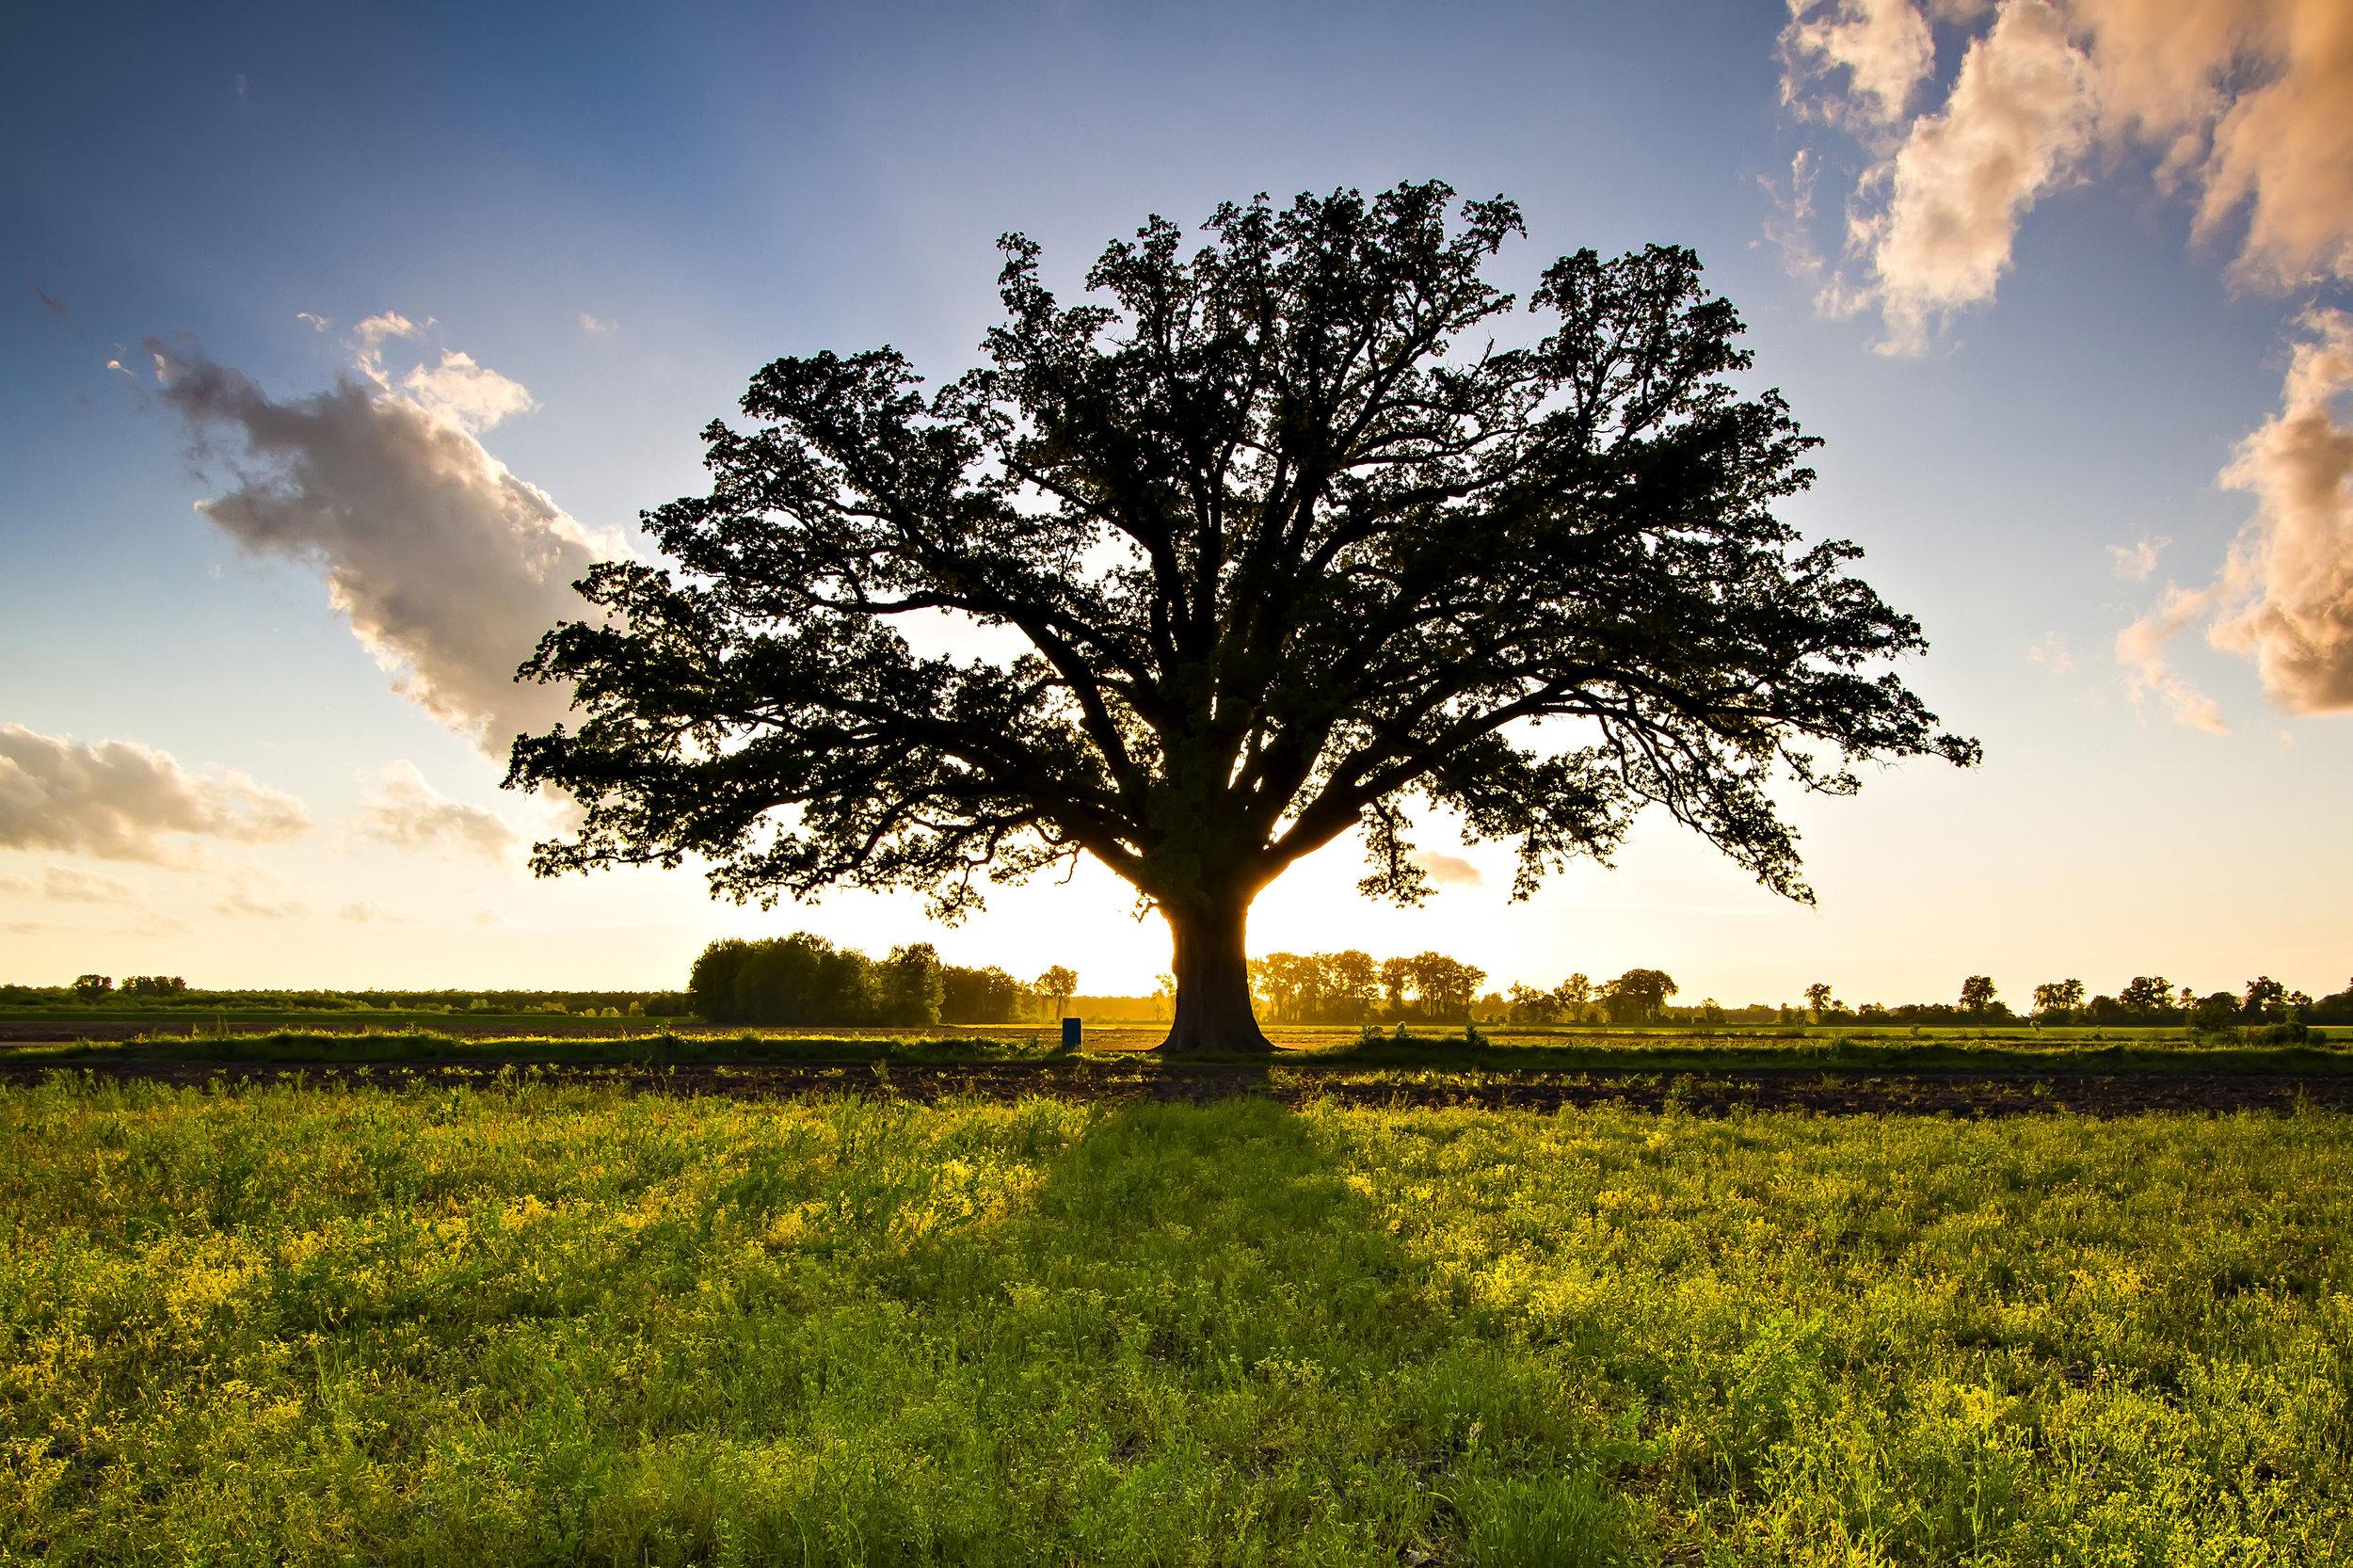 The Mighty Bur Oak - by Walter Reins